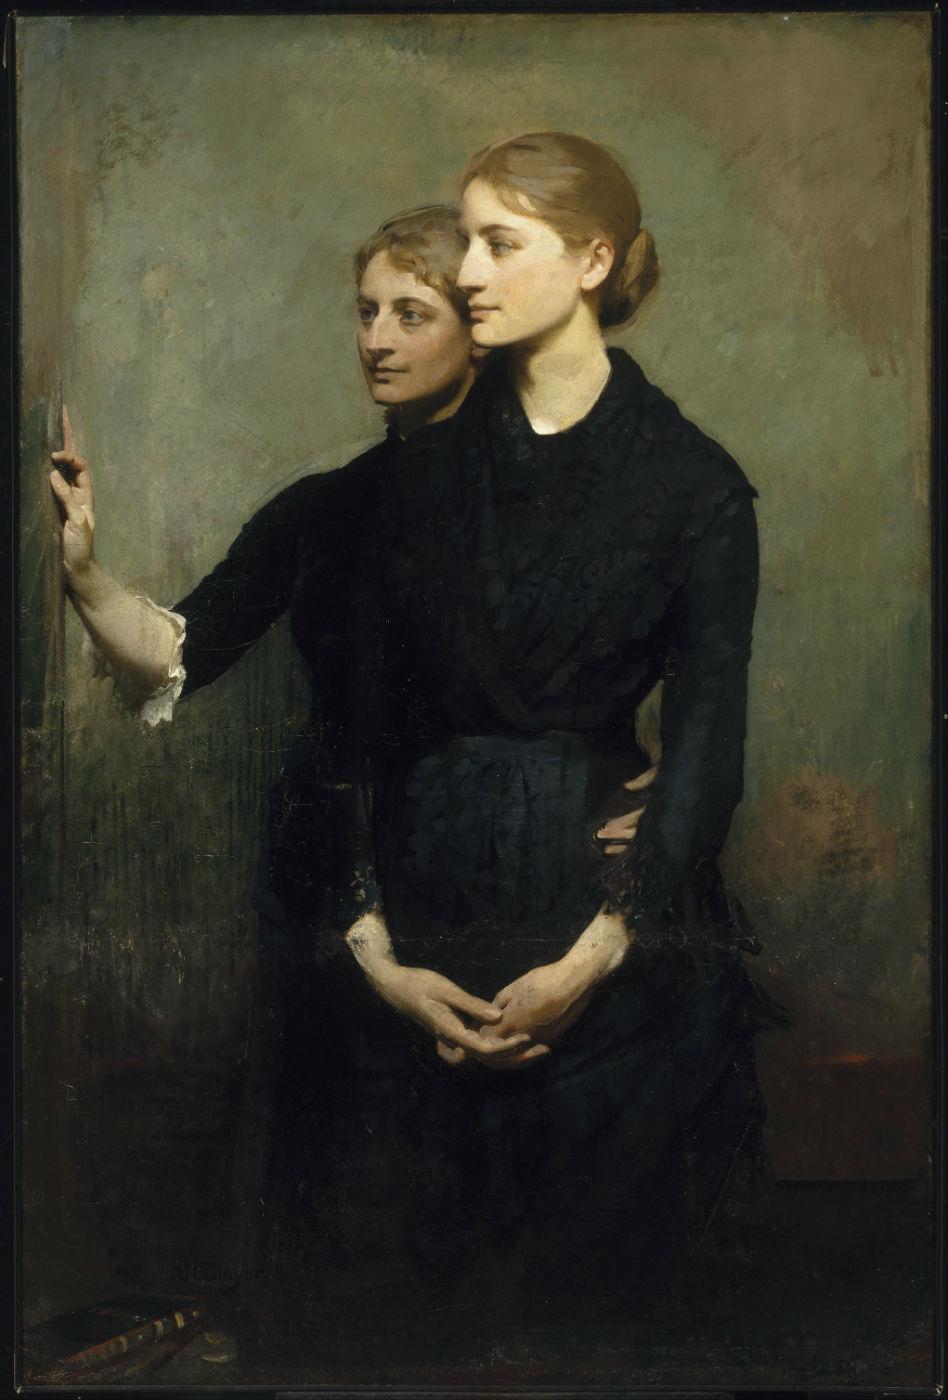 Abbott Handerson Thayer - The Sisters, 1884